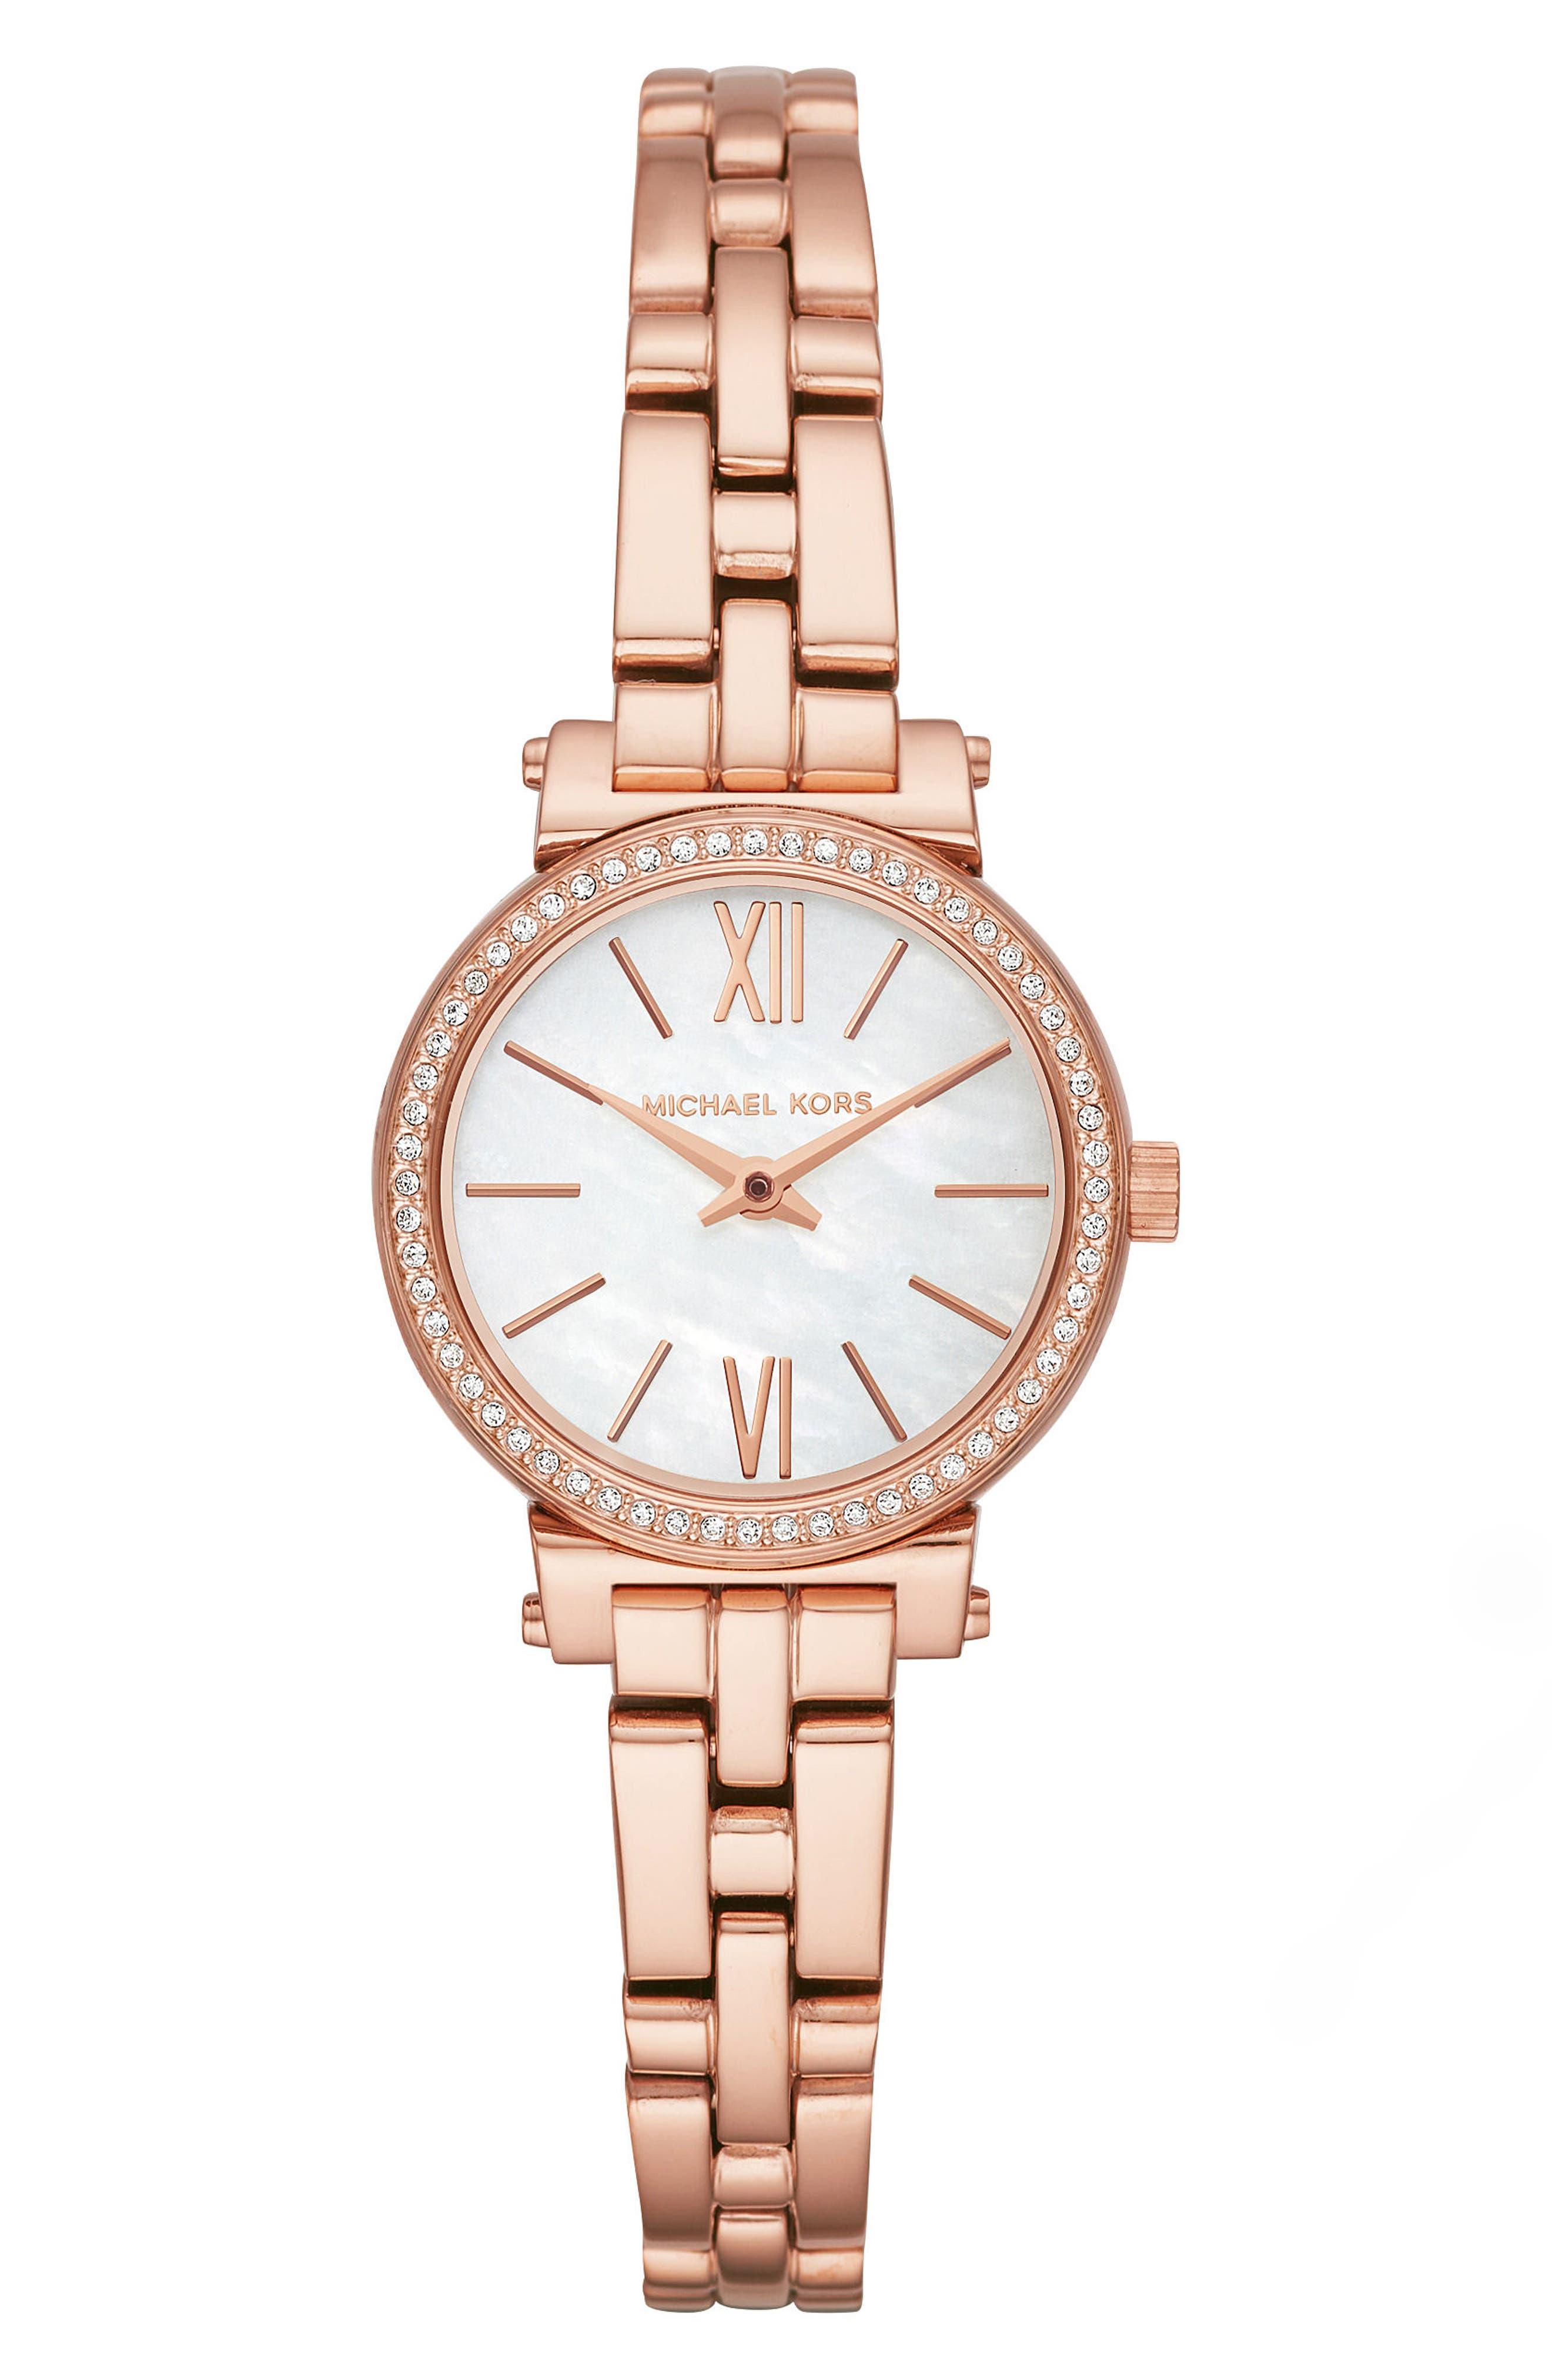 Michael Kors Sofie Bracelet Watch, 26mm